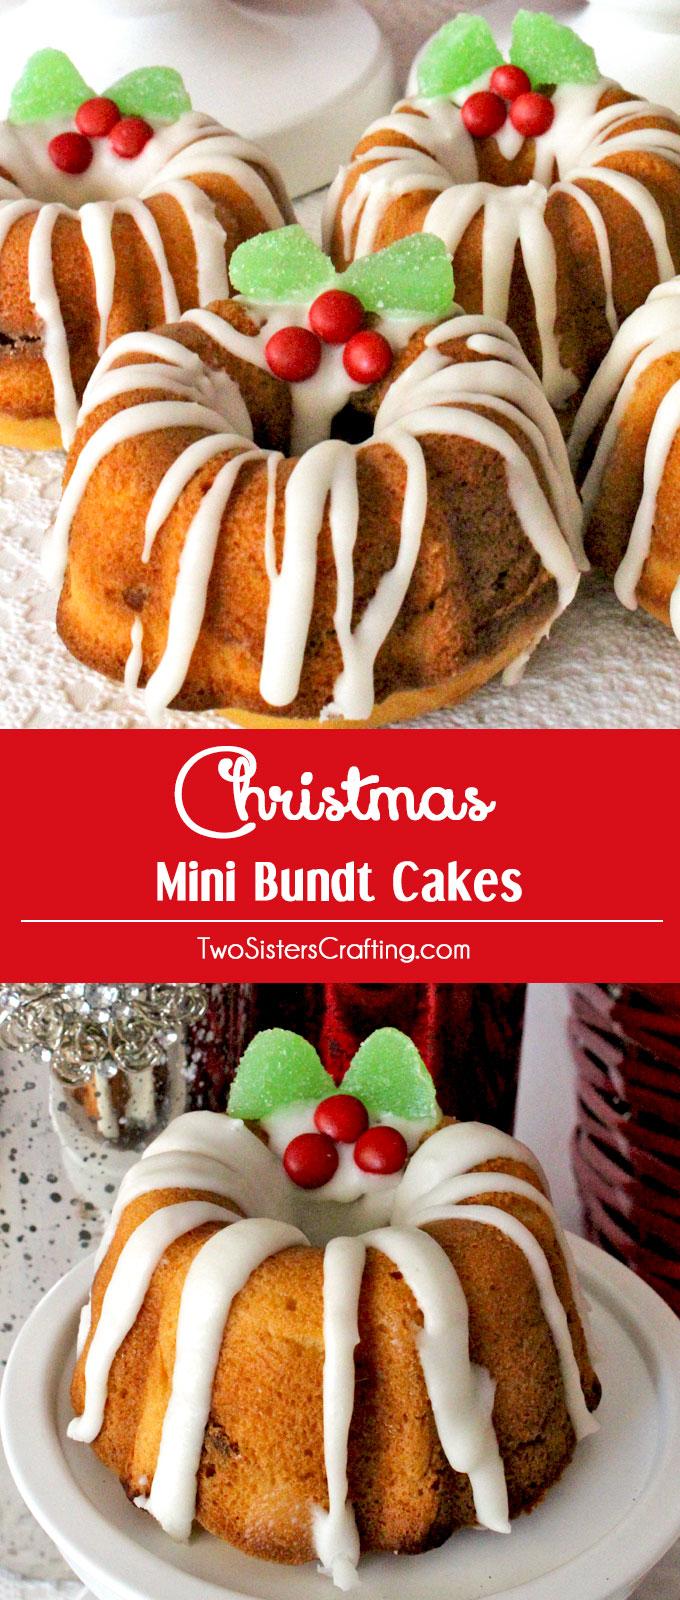 Christmas Mini Bundt Cake Ideas